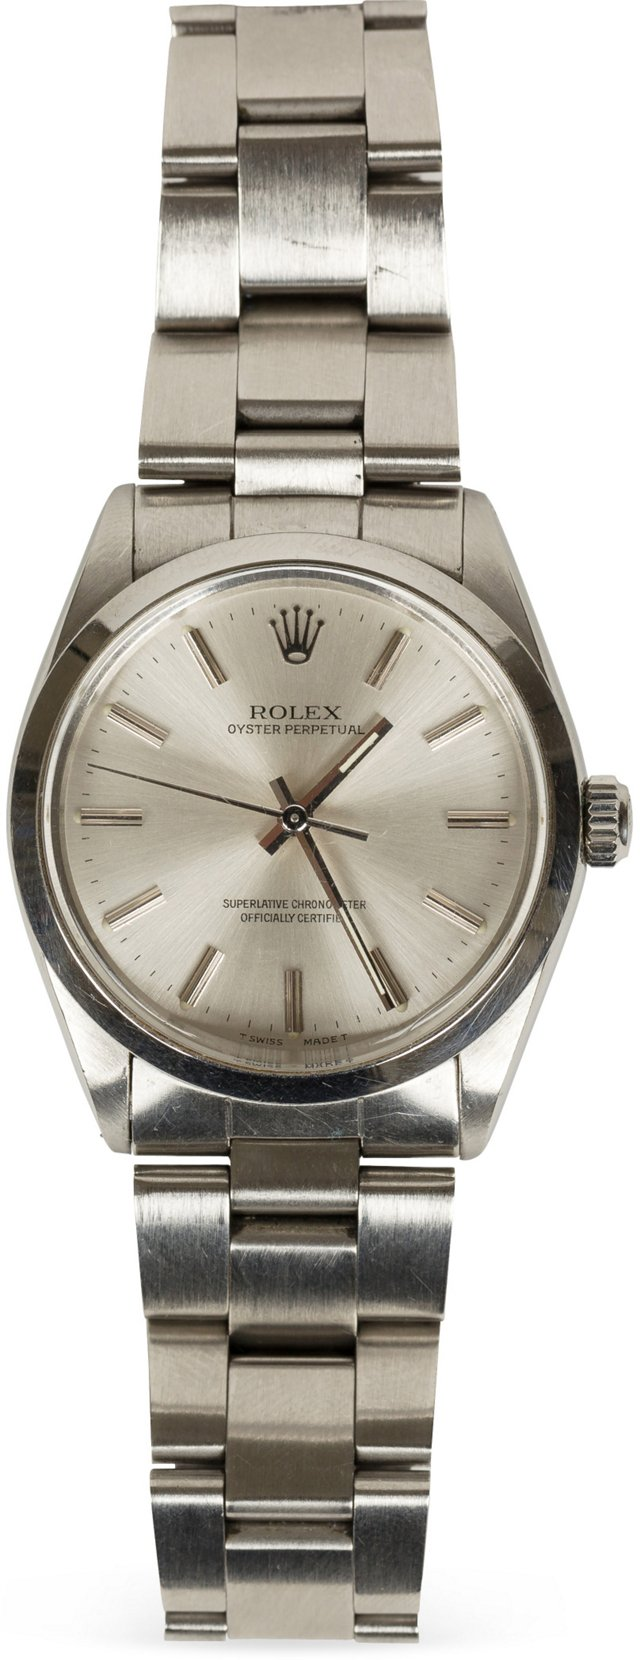 1988 Men's Rolex Oyster Perpetual